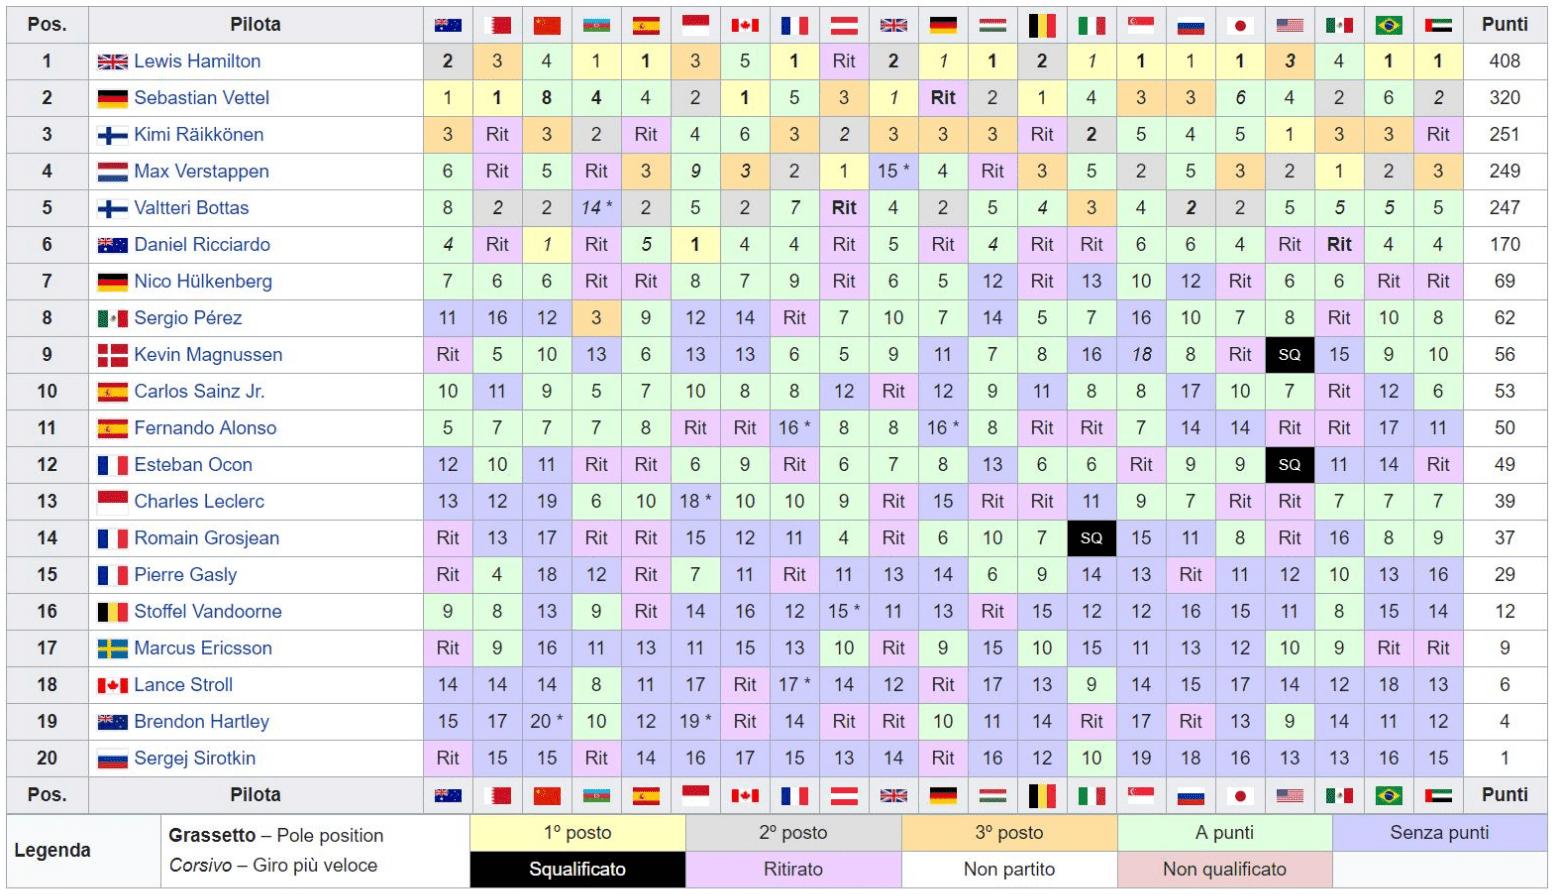 Classifica-Piloti-Formula1-2018